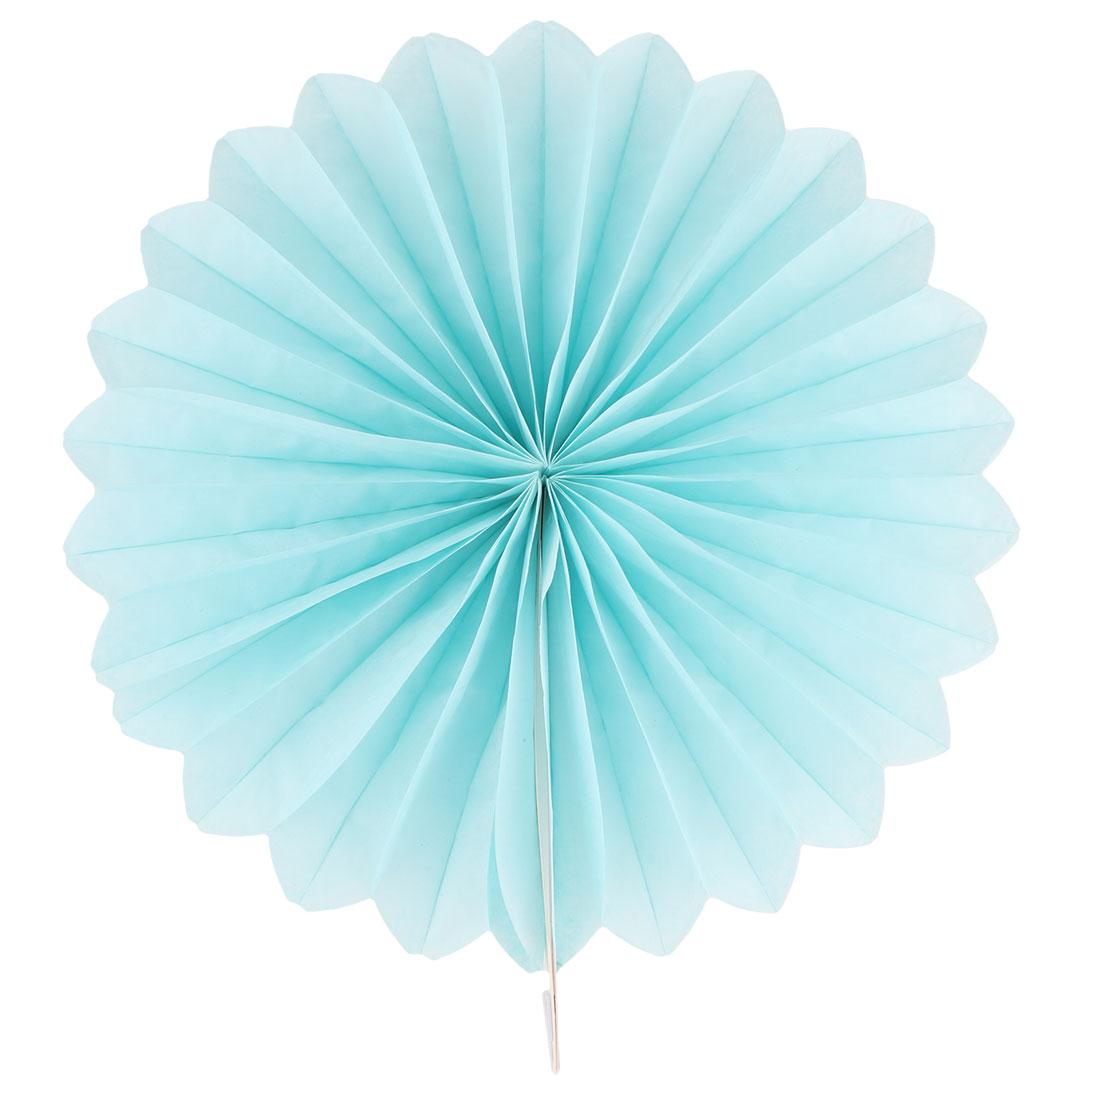 Tissue Paper Folding Fan Flower Blue for Party Birthday Window Wedding Home Decor